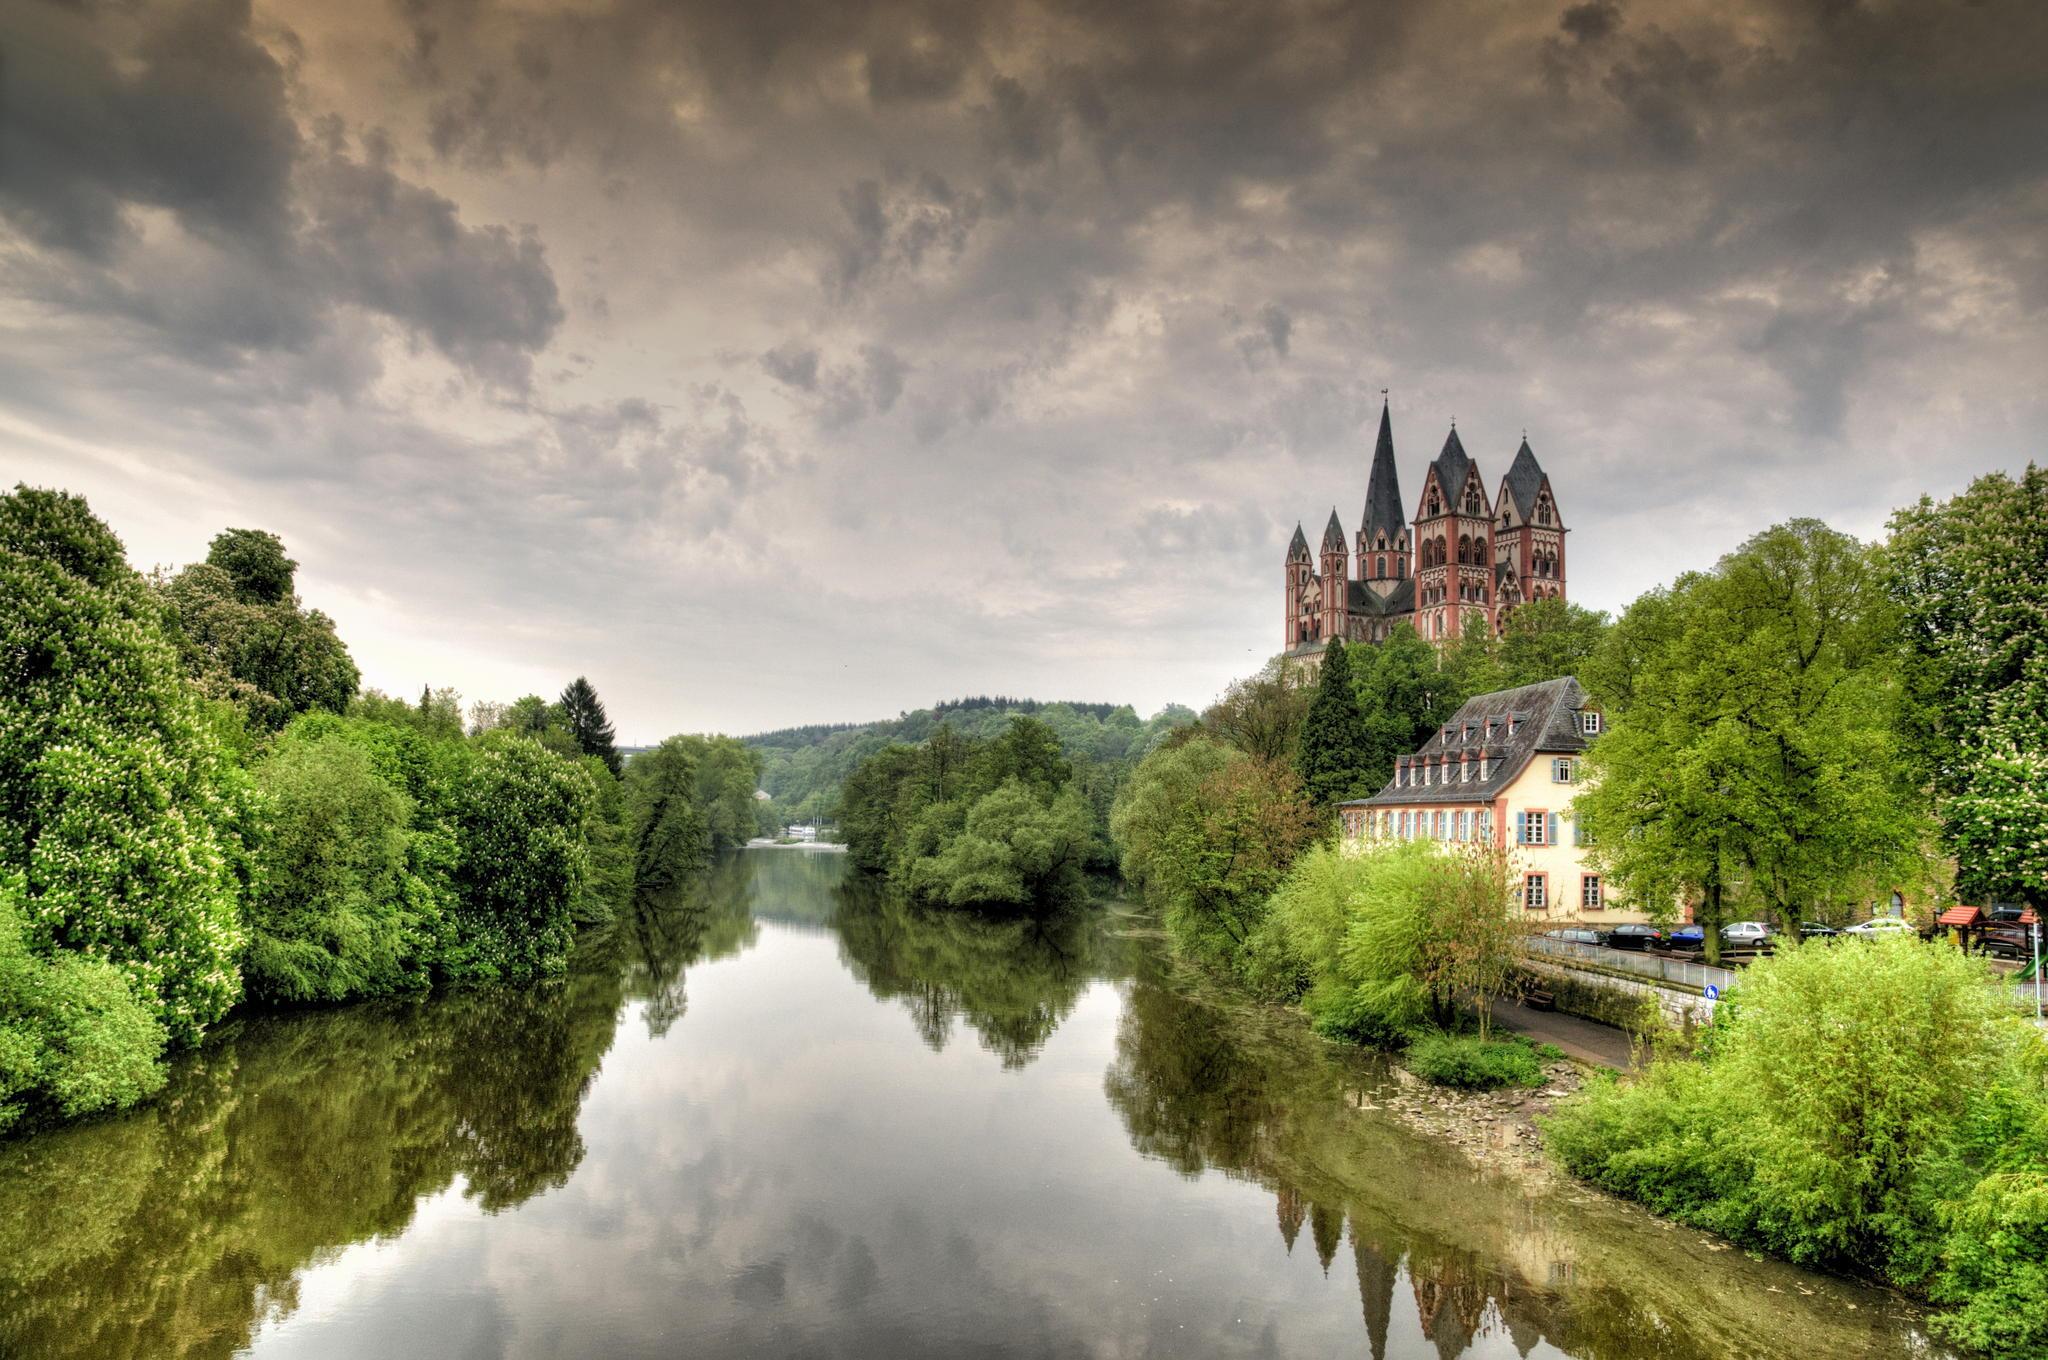 Lorch Village, Hesse, Rhine River, Germany  № 78317 загрузить